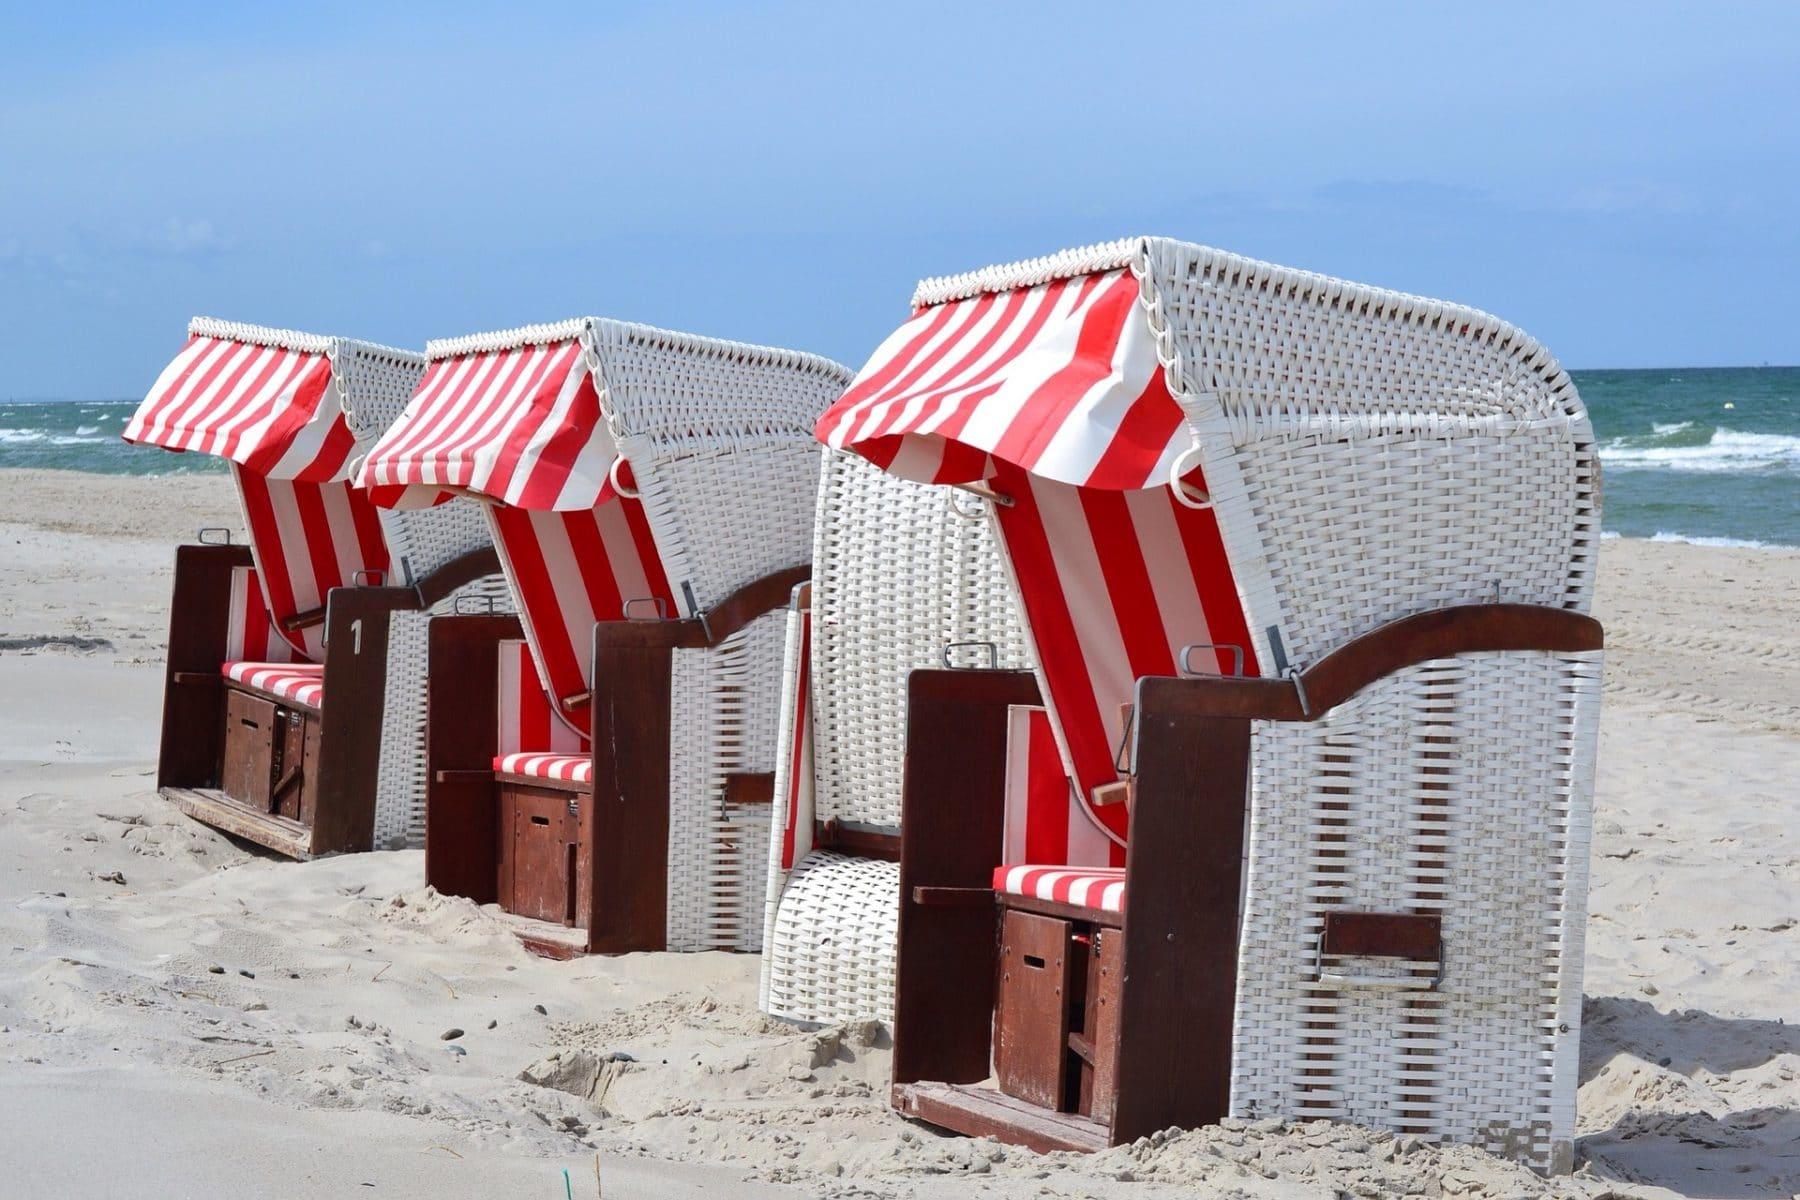 Rot gestreifte Strandkörbe an Sandstrand